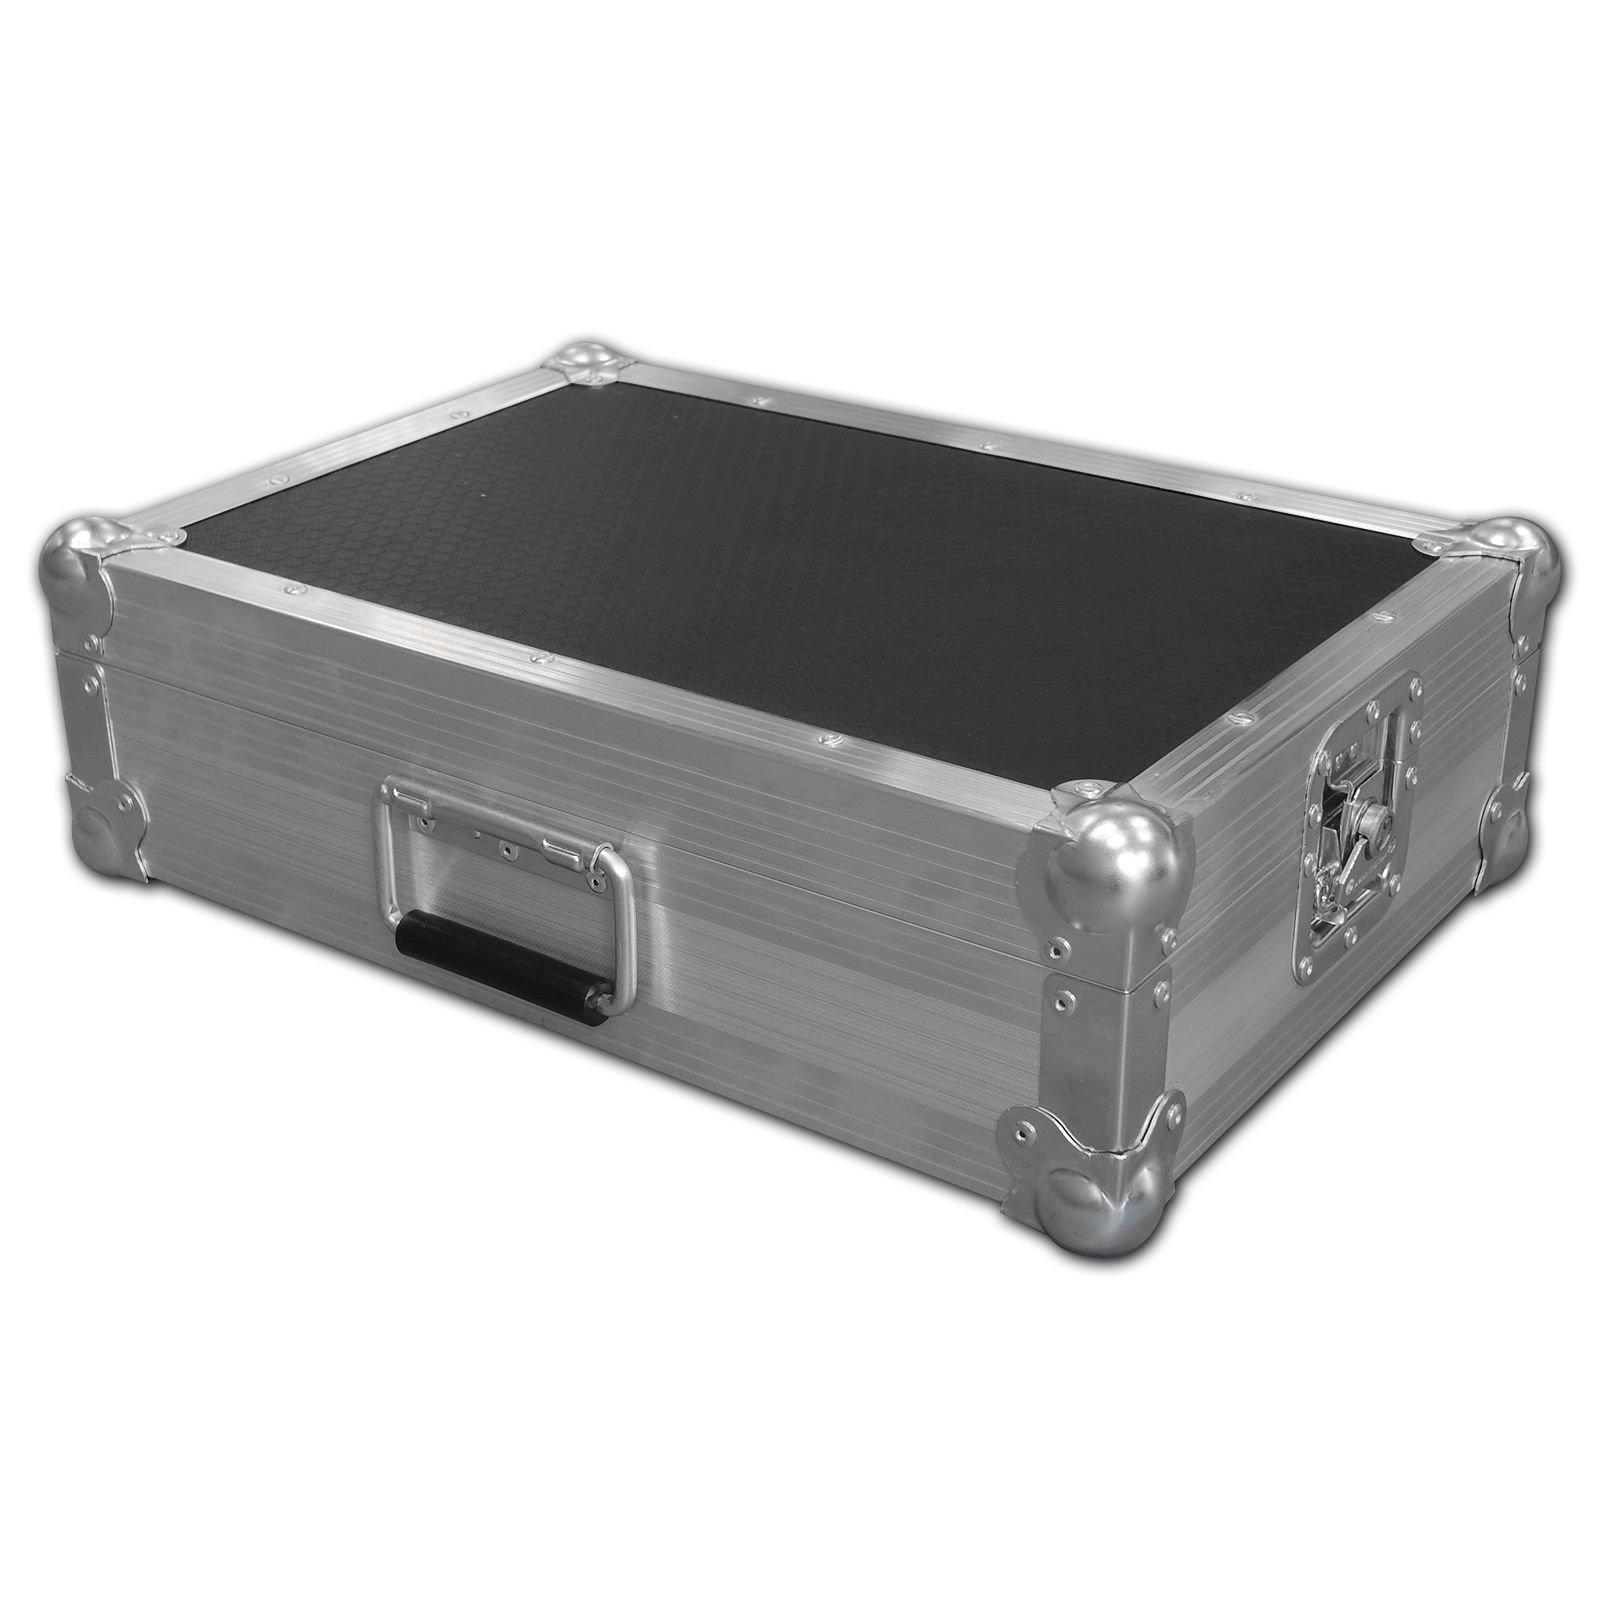 Yamaha mg 12 4 mixer flight case for Yamaha mg12 case